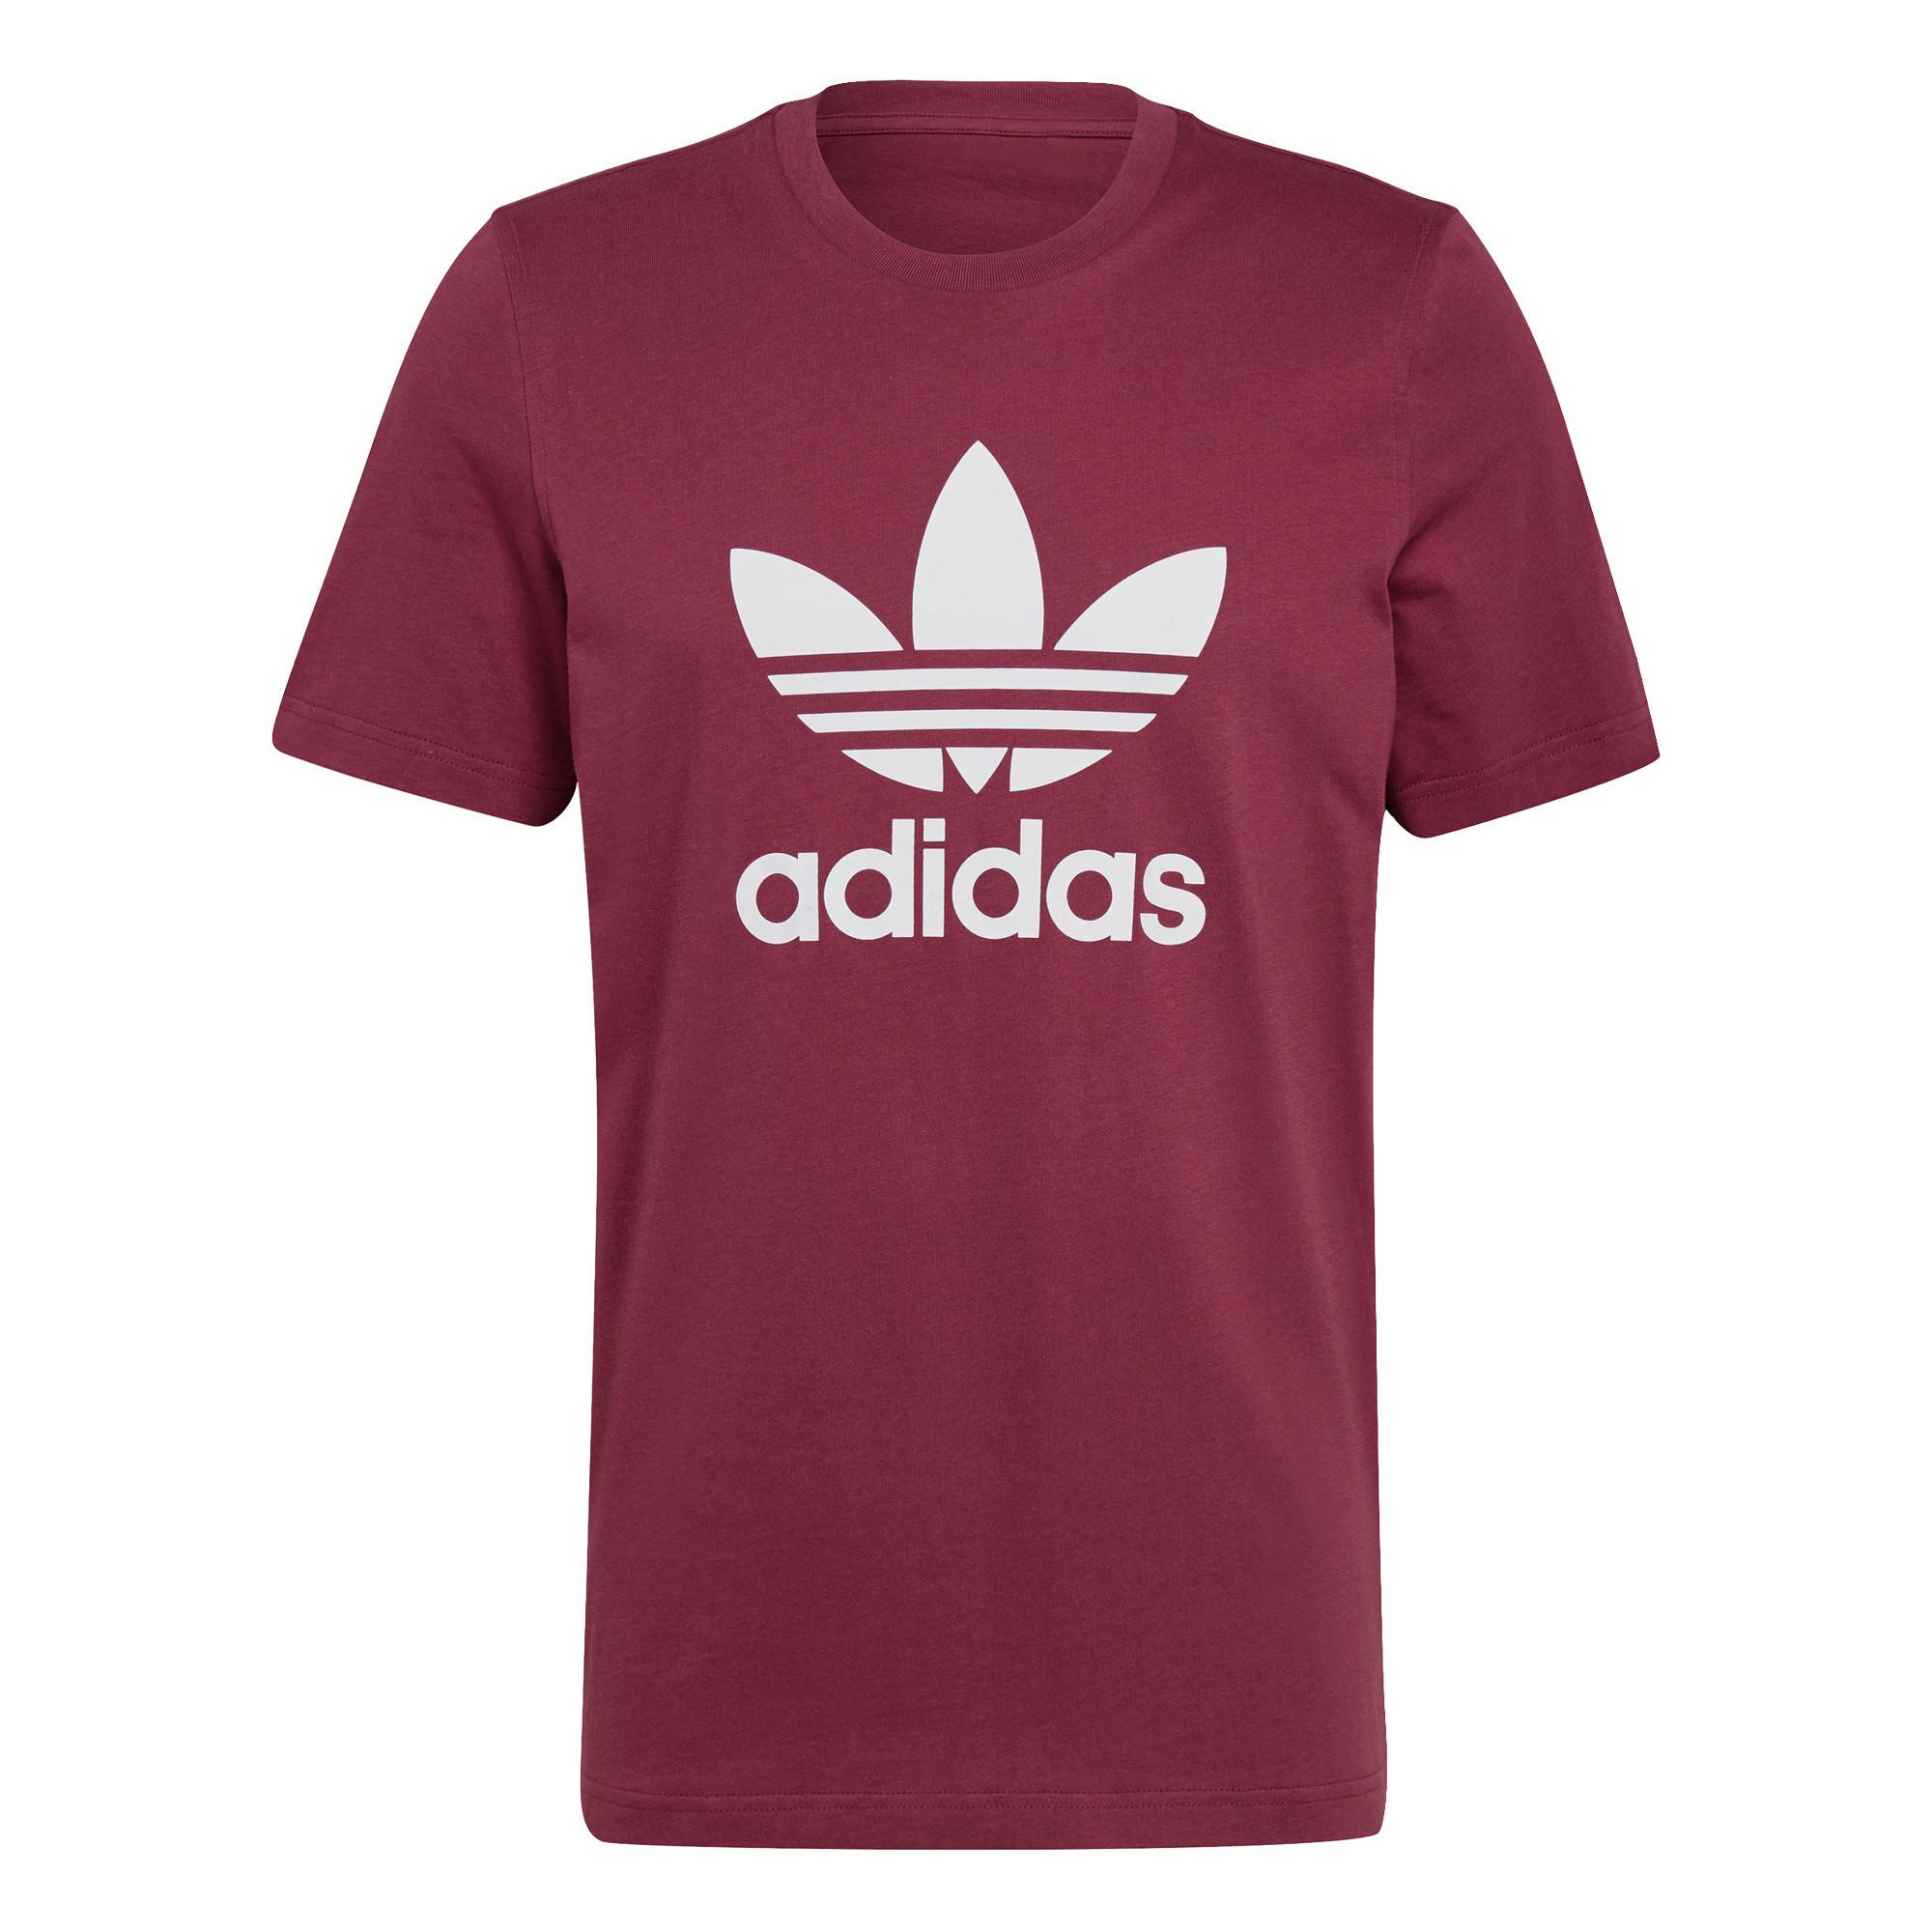 T-shirt uomo adicolor Classics Trefoil, Bianco/Rosso, large image number 0